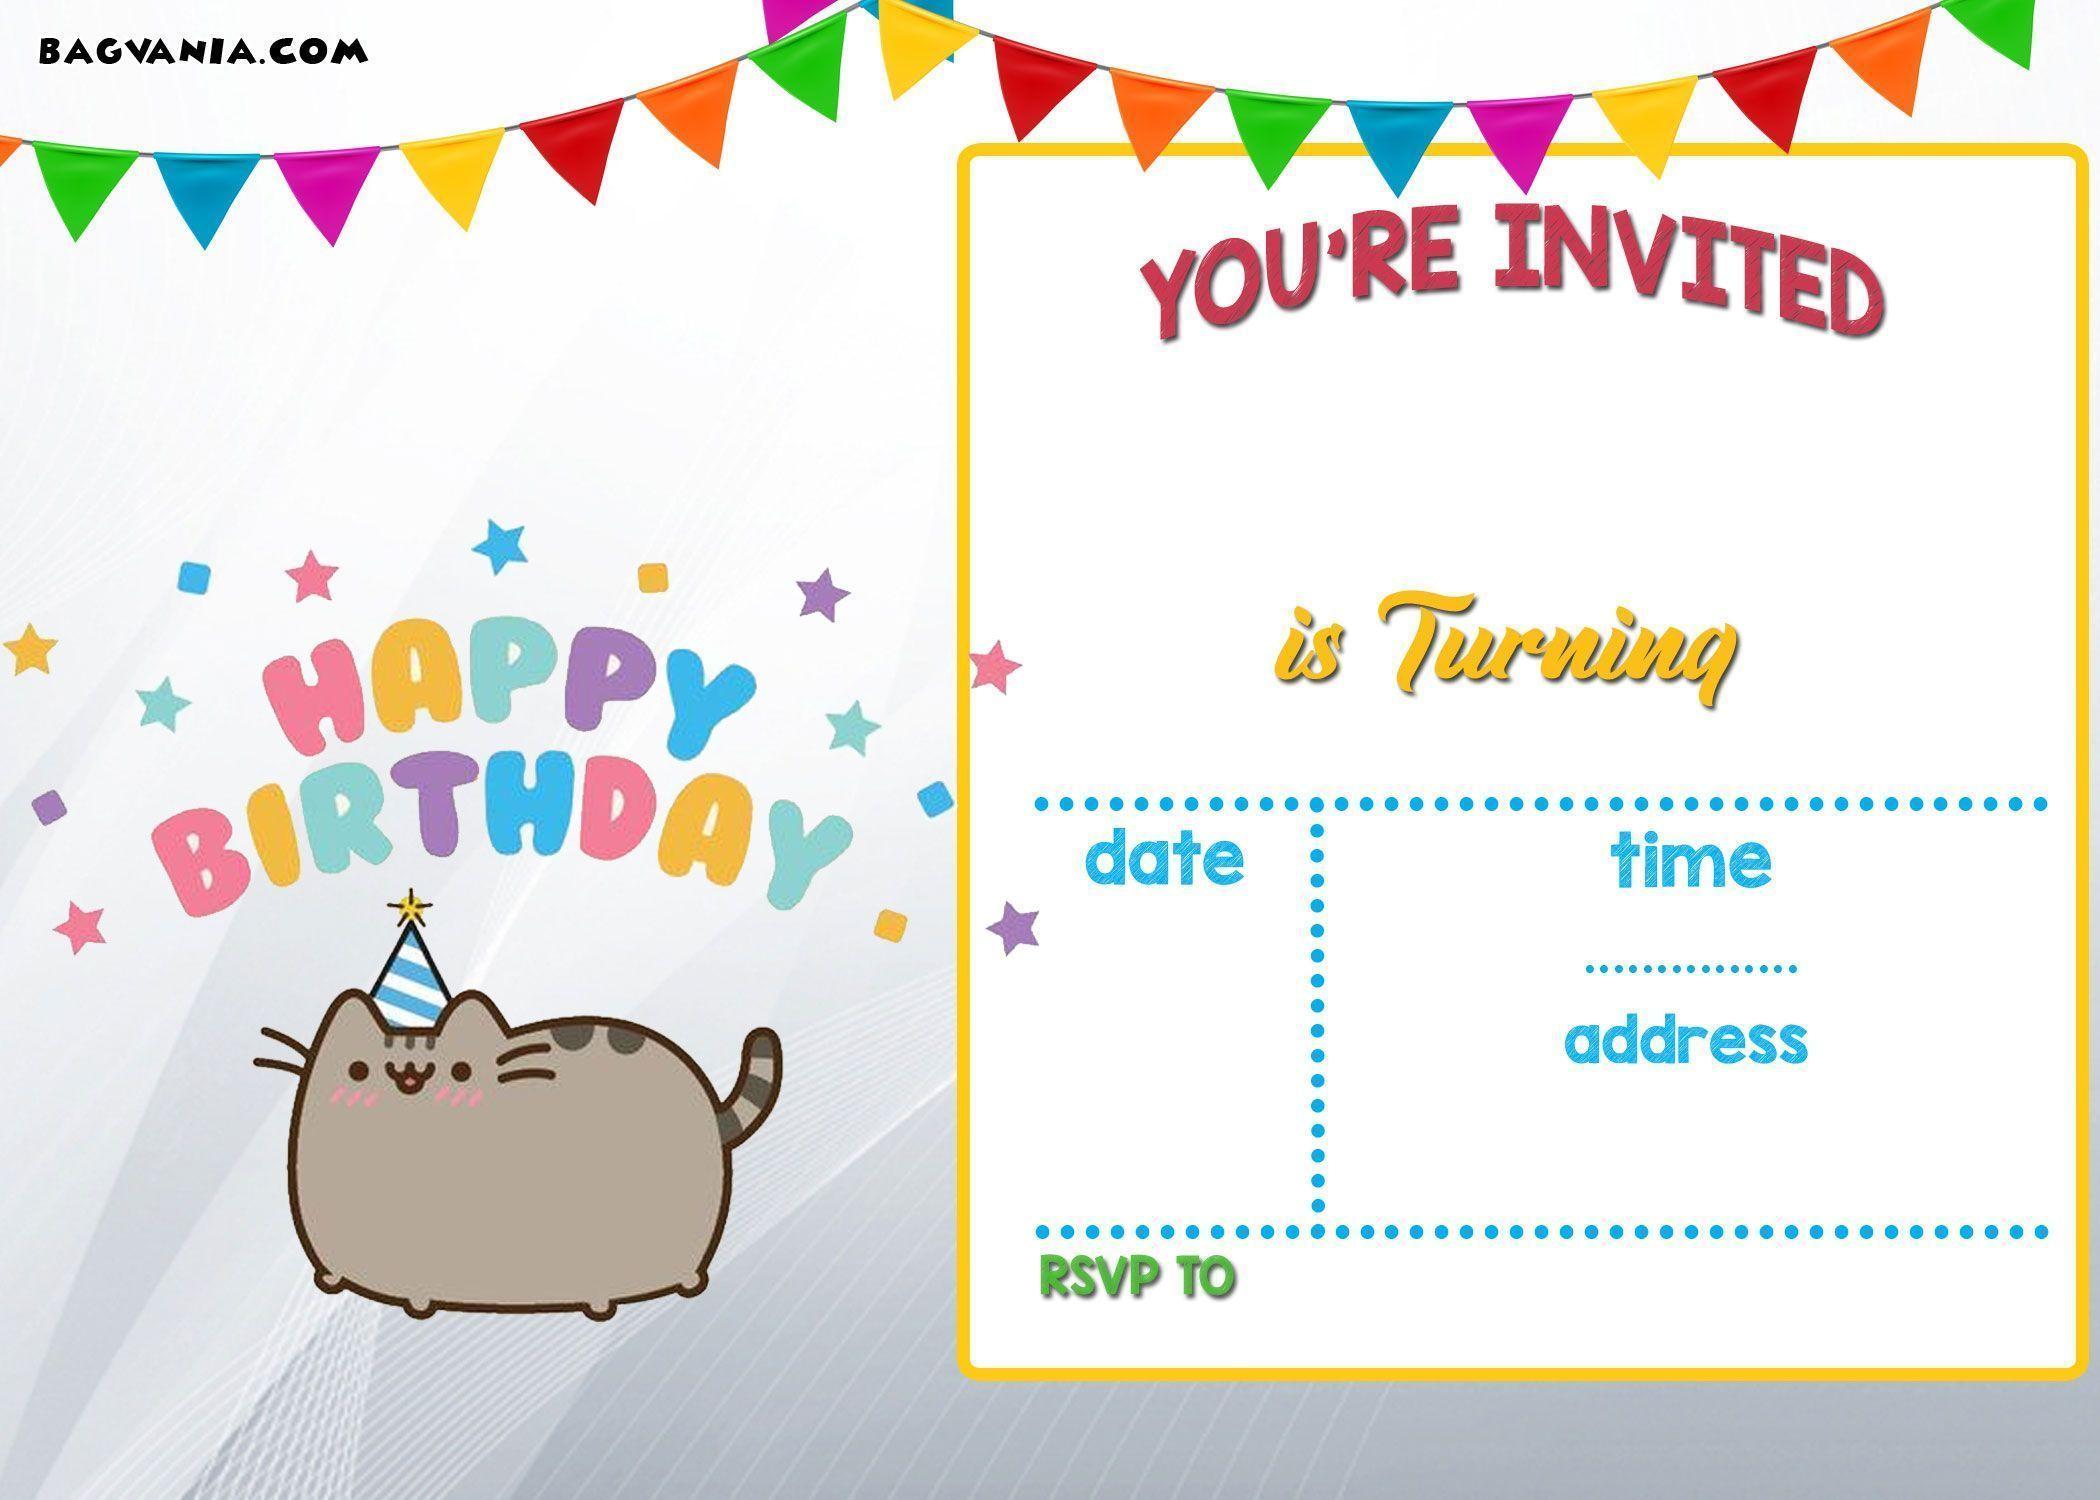 Free Printable Pusheen Birthday Invitation Template Free Printable Birthday In 2020 With Images Birthday Party Invitation Templates Free Printable Birthday Invitations Party Invite Template